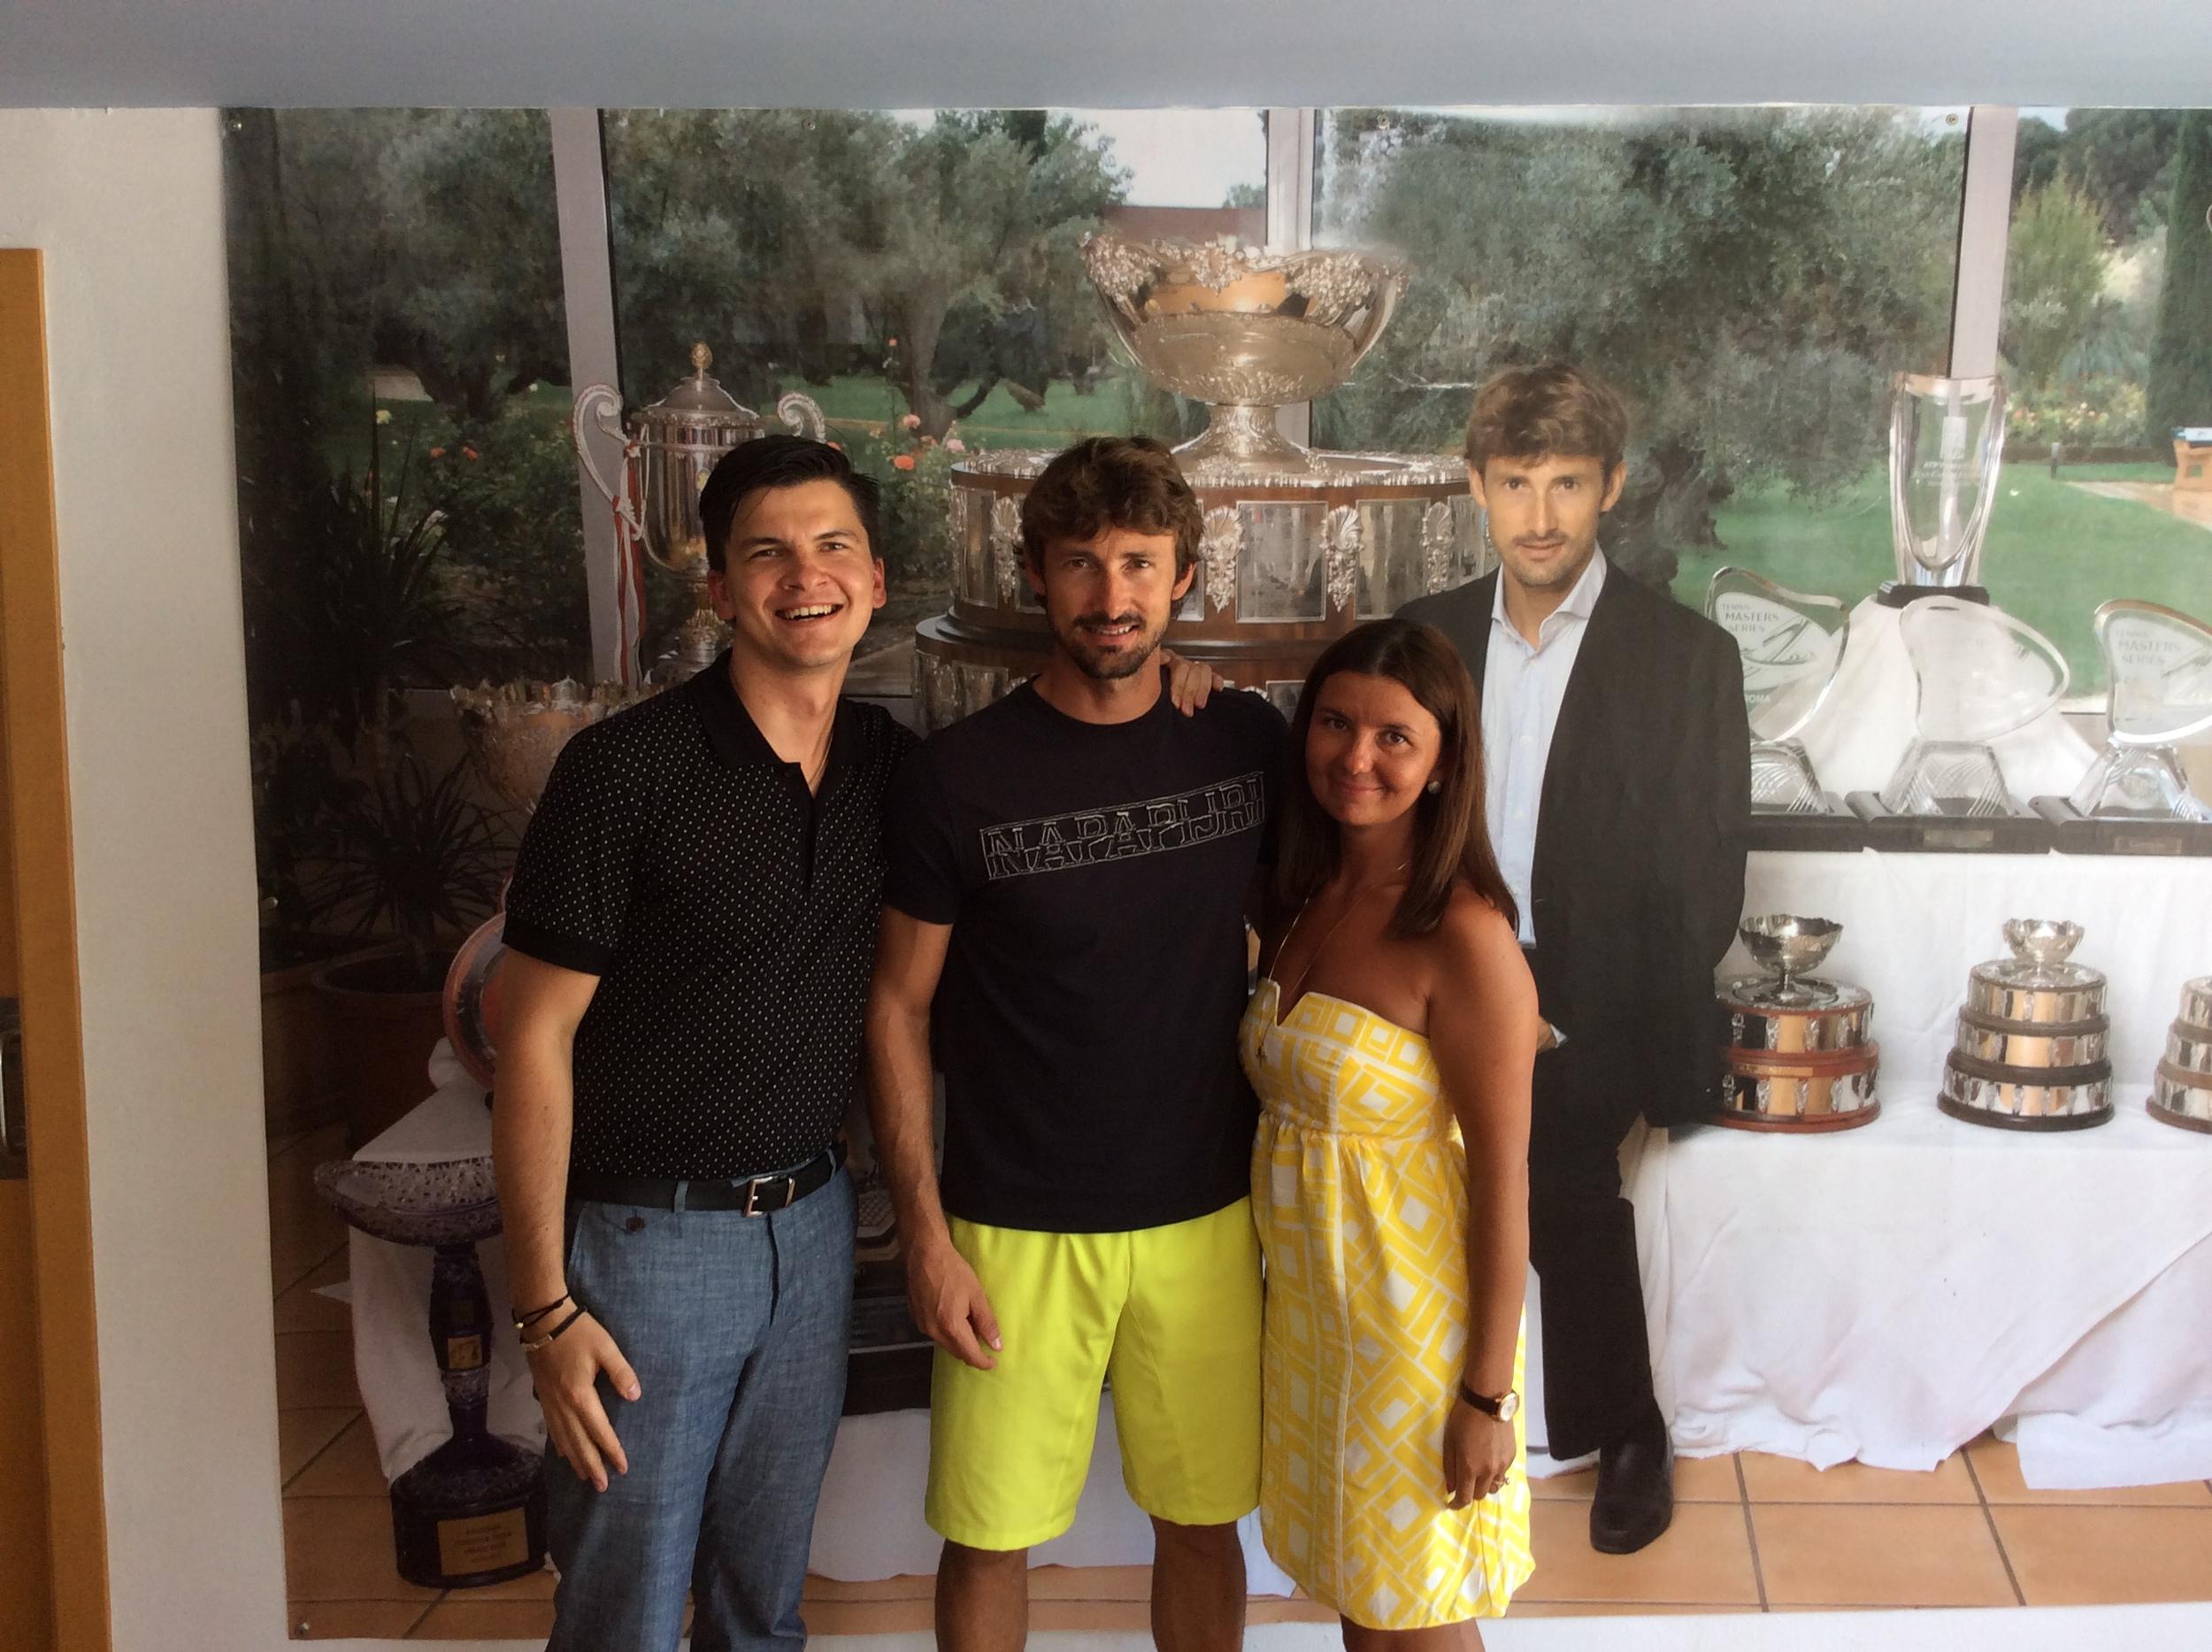 SportCampTravel with Former Former World Number 1 Tennis Player Juan Carlos Ferrero